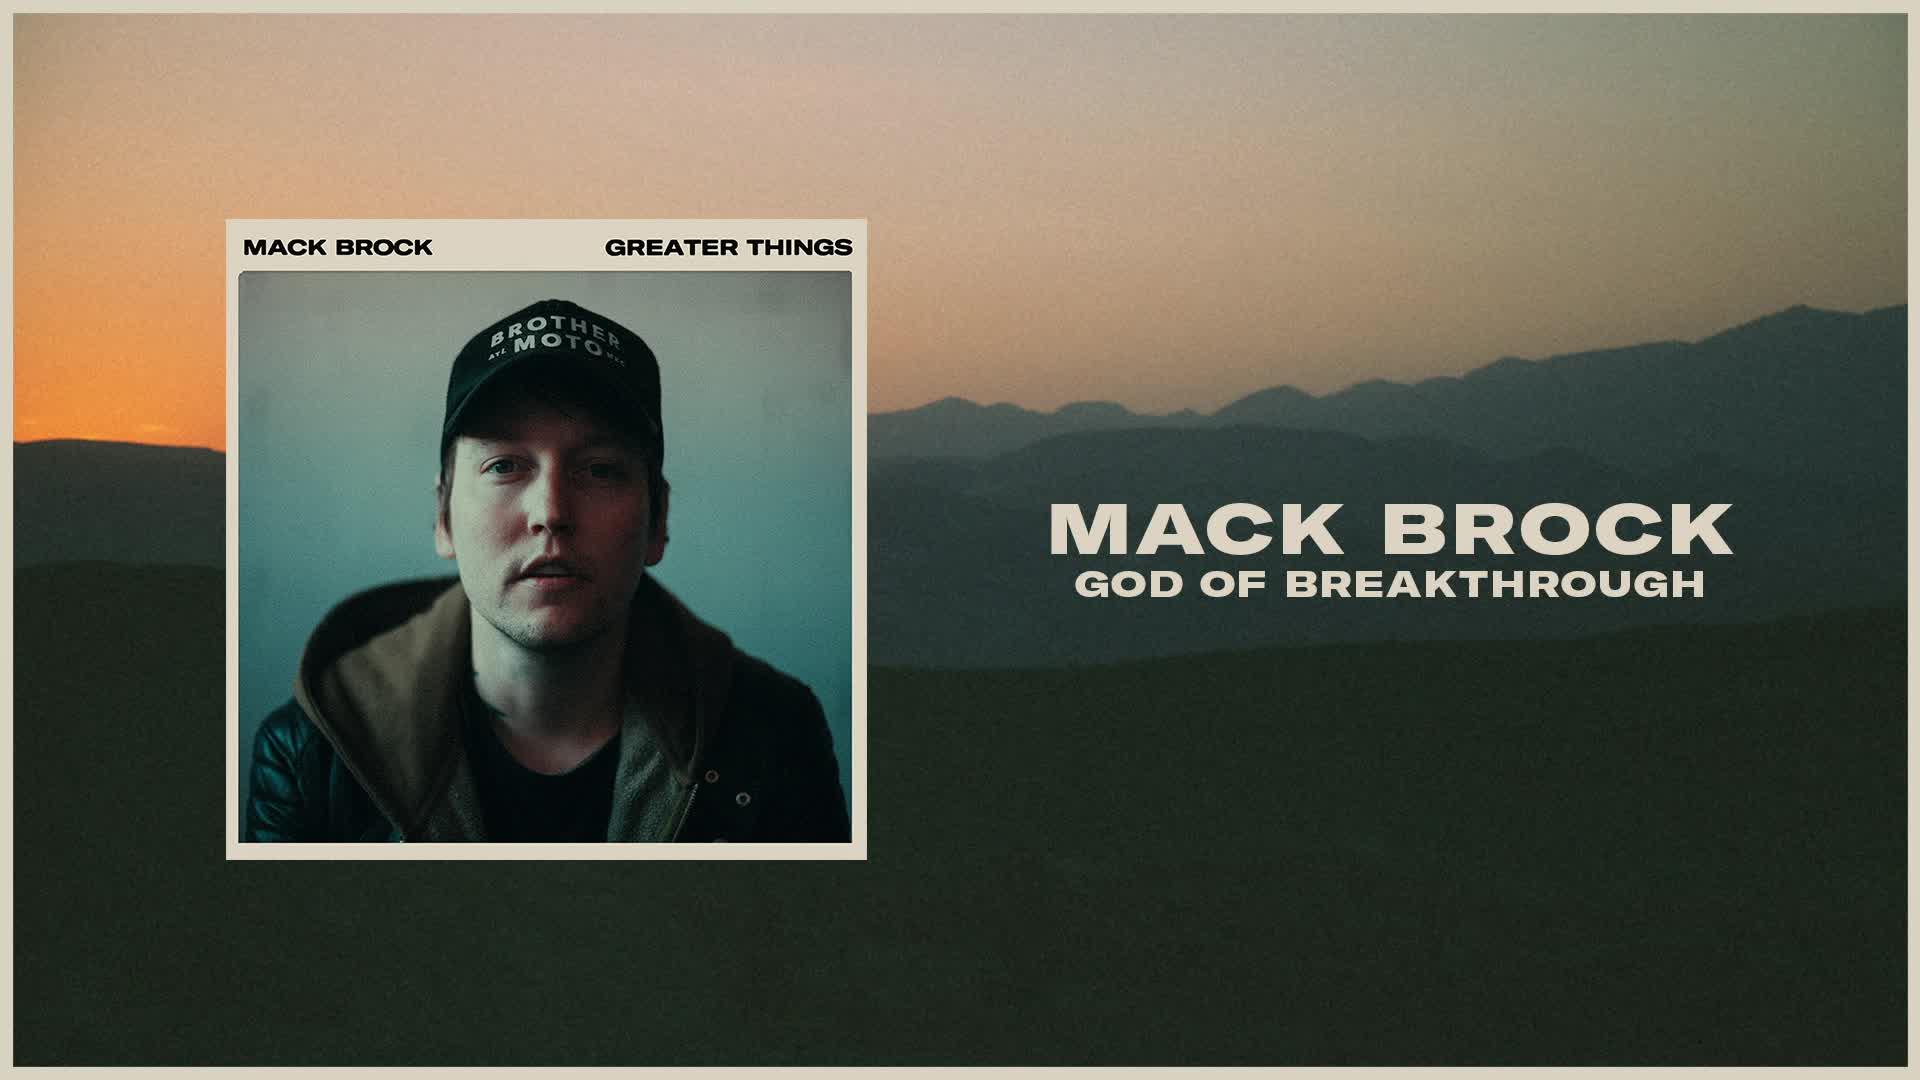 Mack Brock - God Of Breakthrough